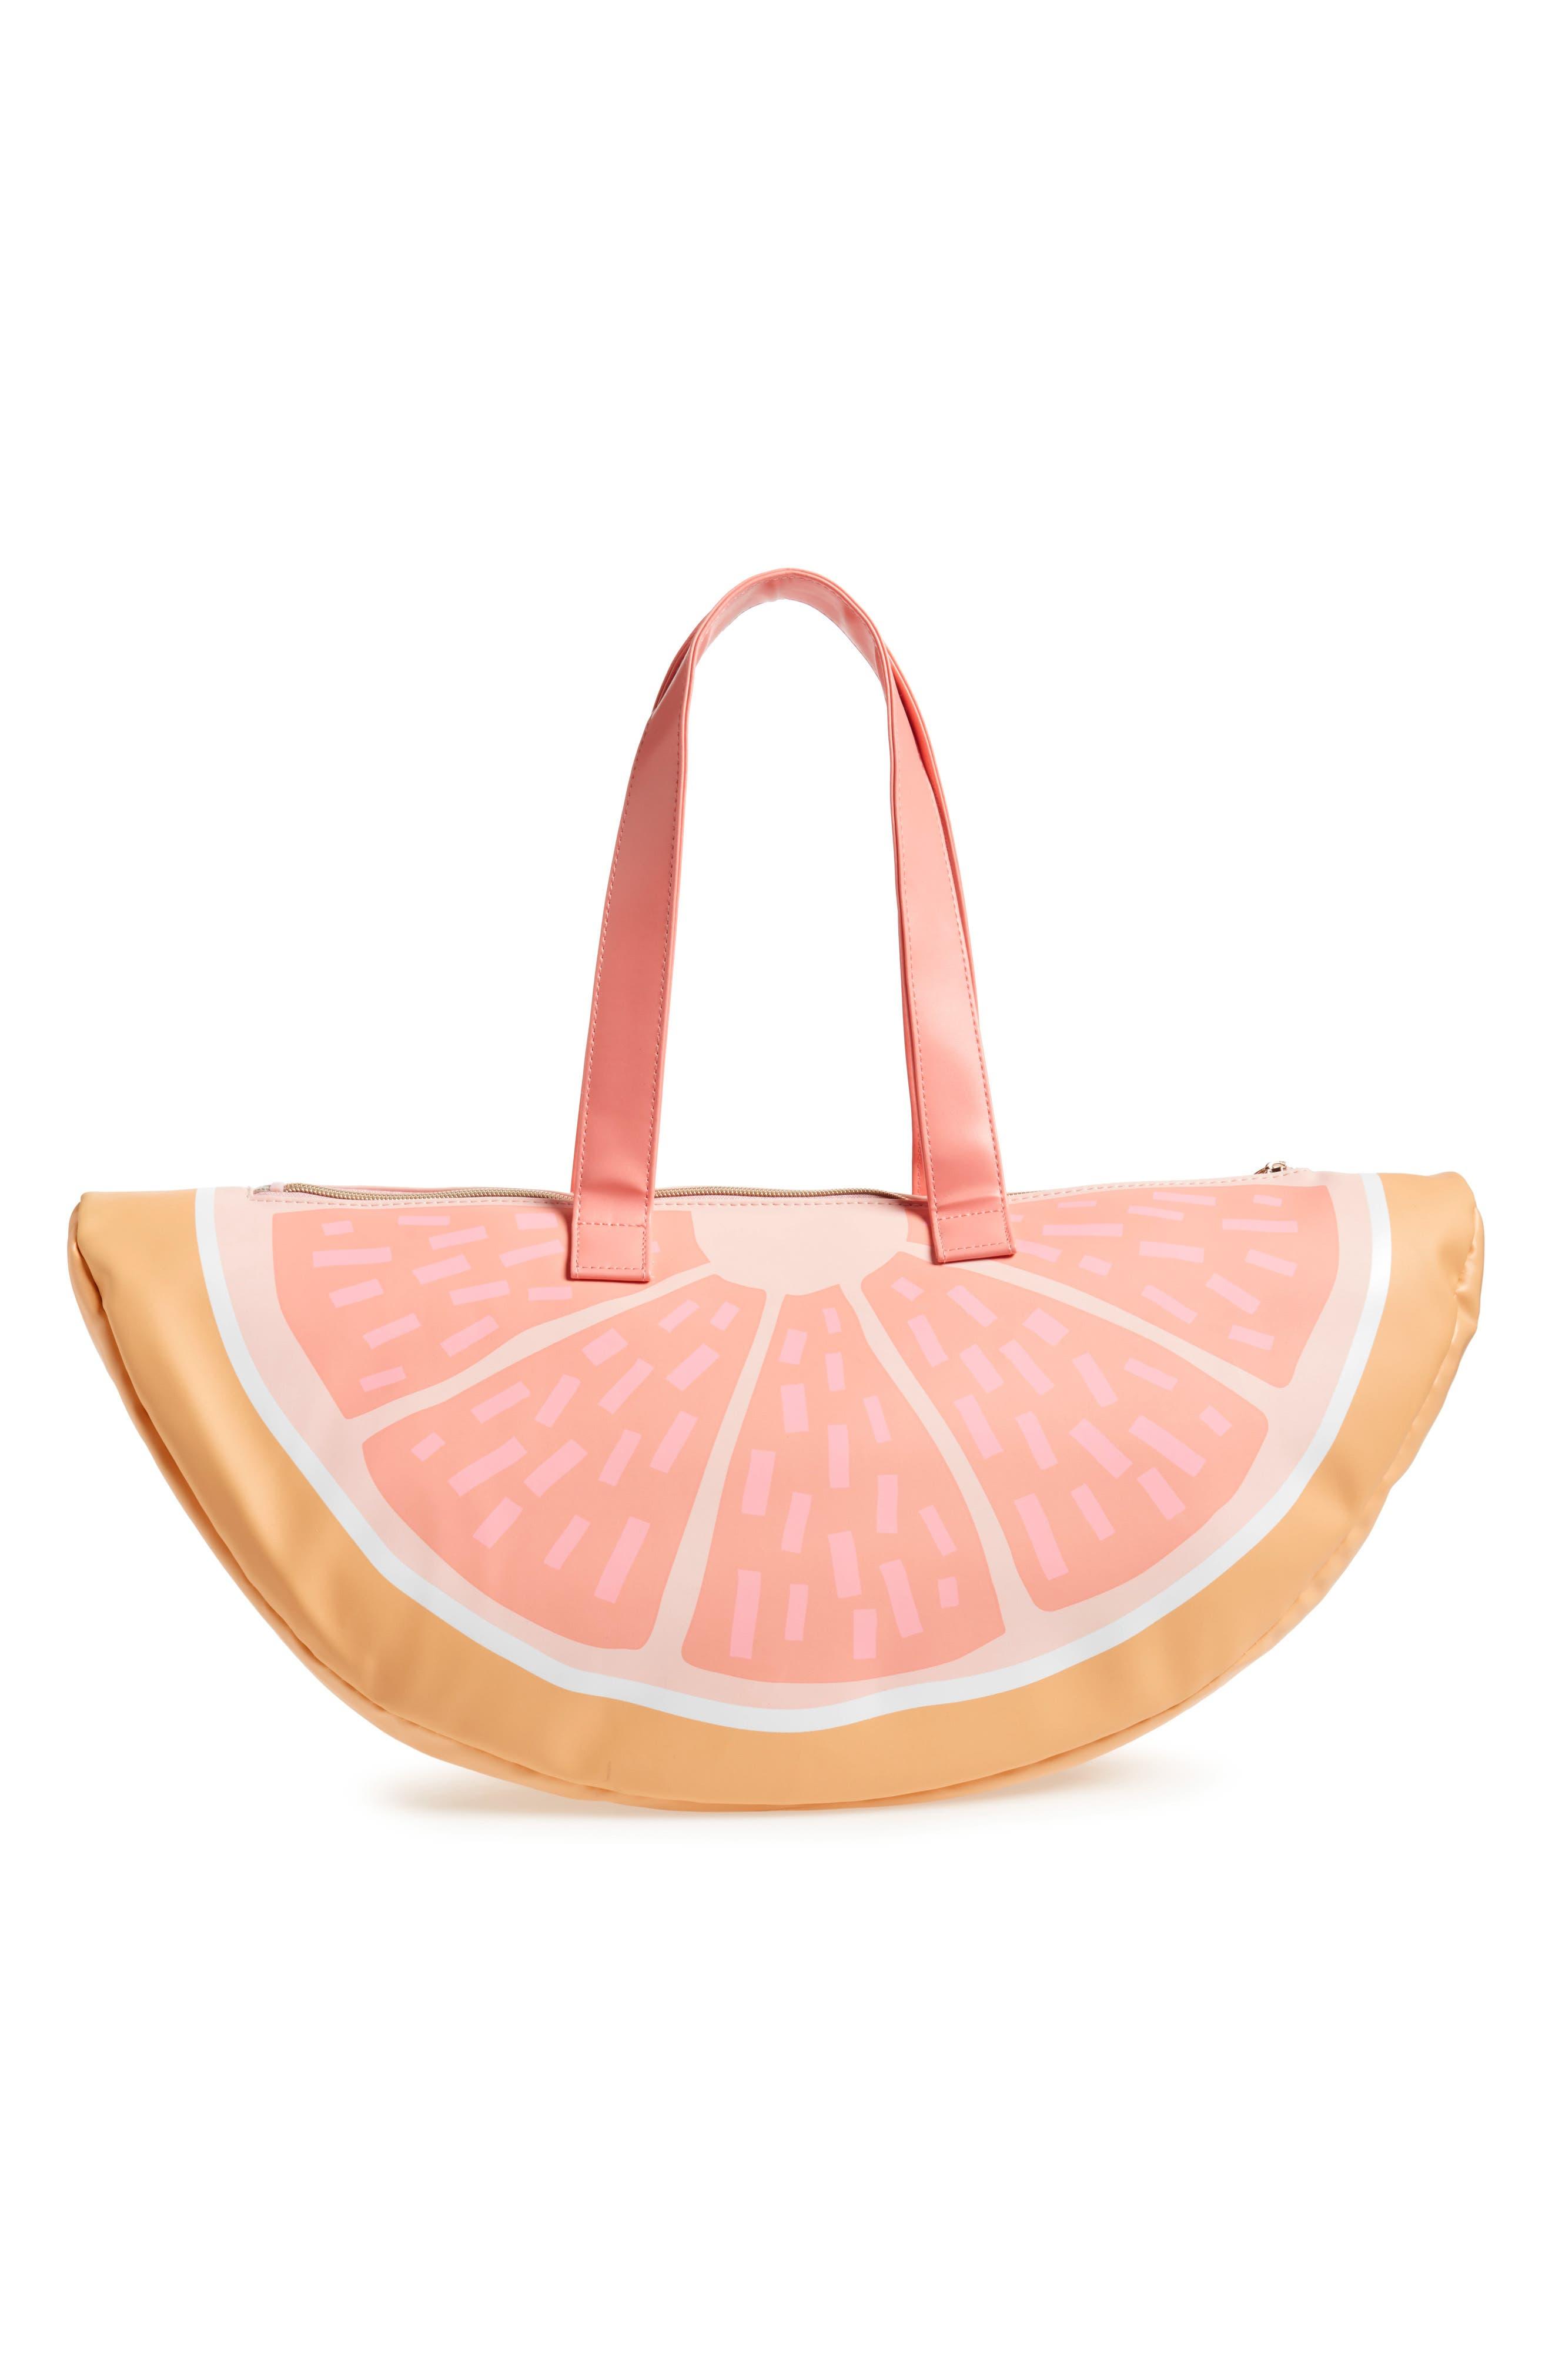 Grapefruit Cooler Bag,                             Alternate thumbnail 3, color,                             Coral